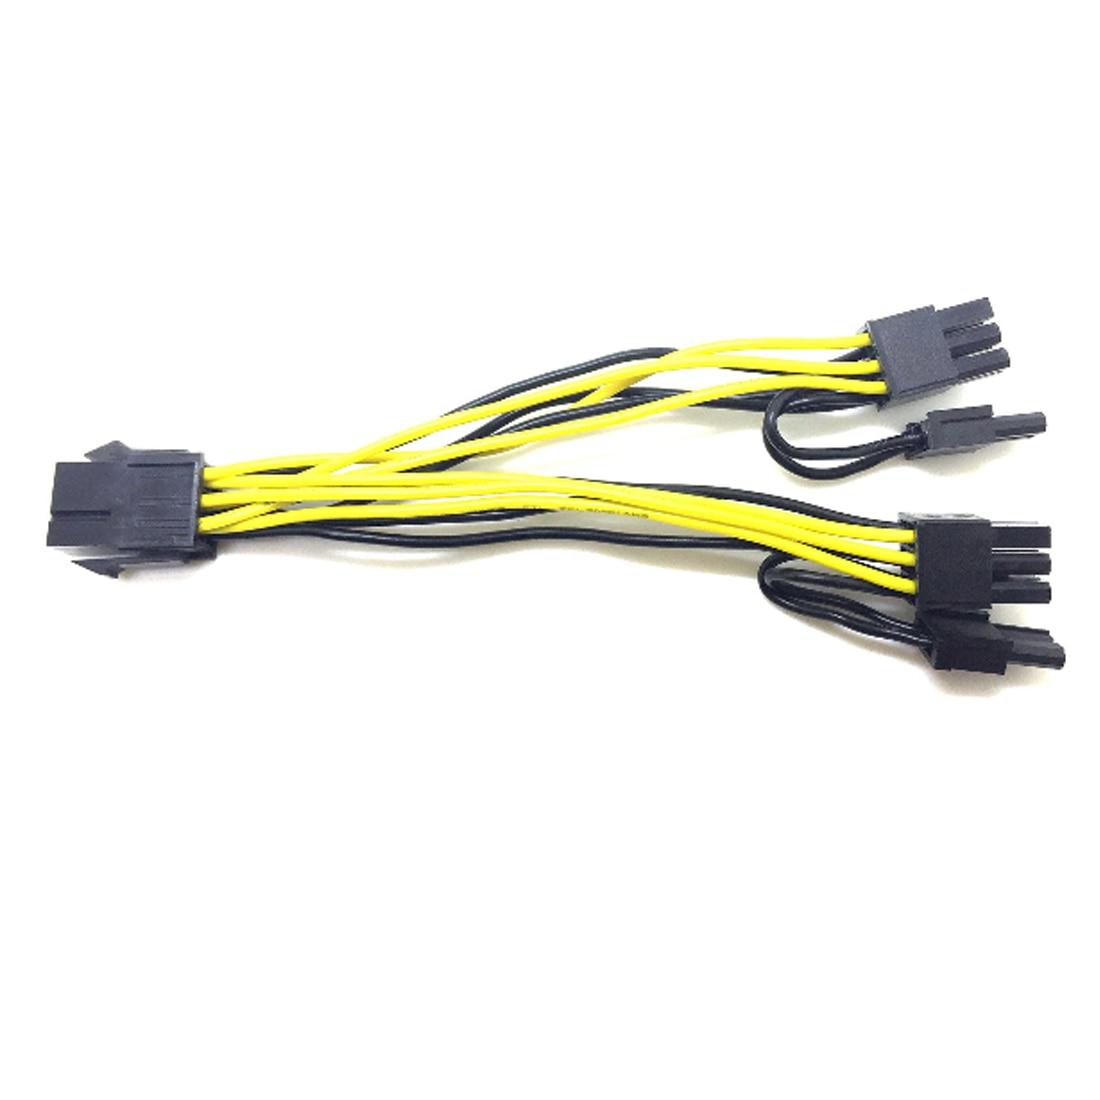 все цены на Marsnaska 6-pin PCI Express to 2 x PCIe 8 (6+2) pin Motherboard Graphics Video Card PCI-e GPU VGA Splitter Hub Power Cable онлайн